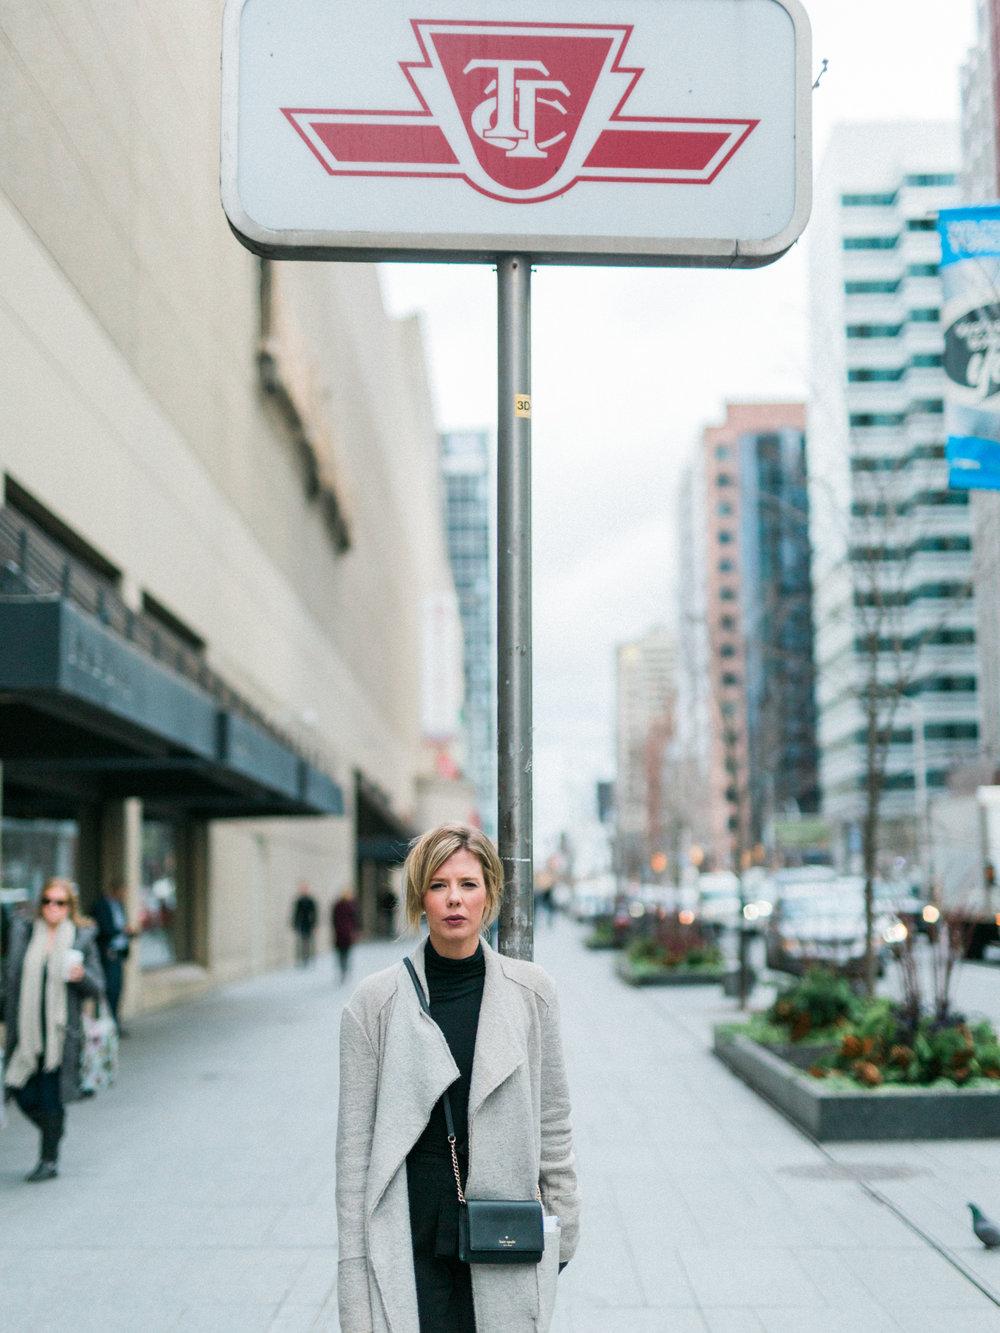 DanielleGirouxPhotography_Toronto_Portrait_StreetPhotography_0C6A1236.jpg